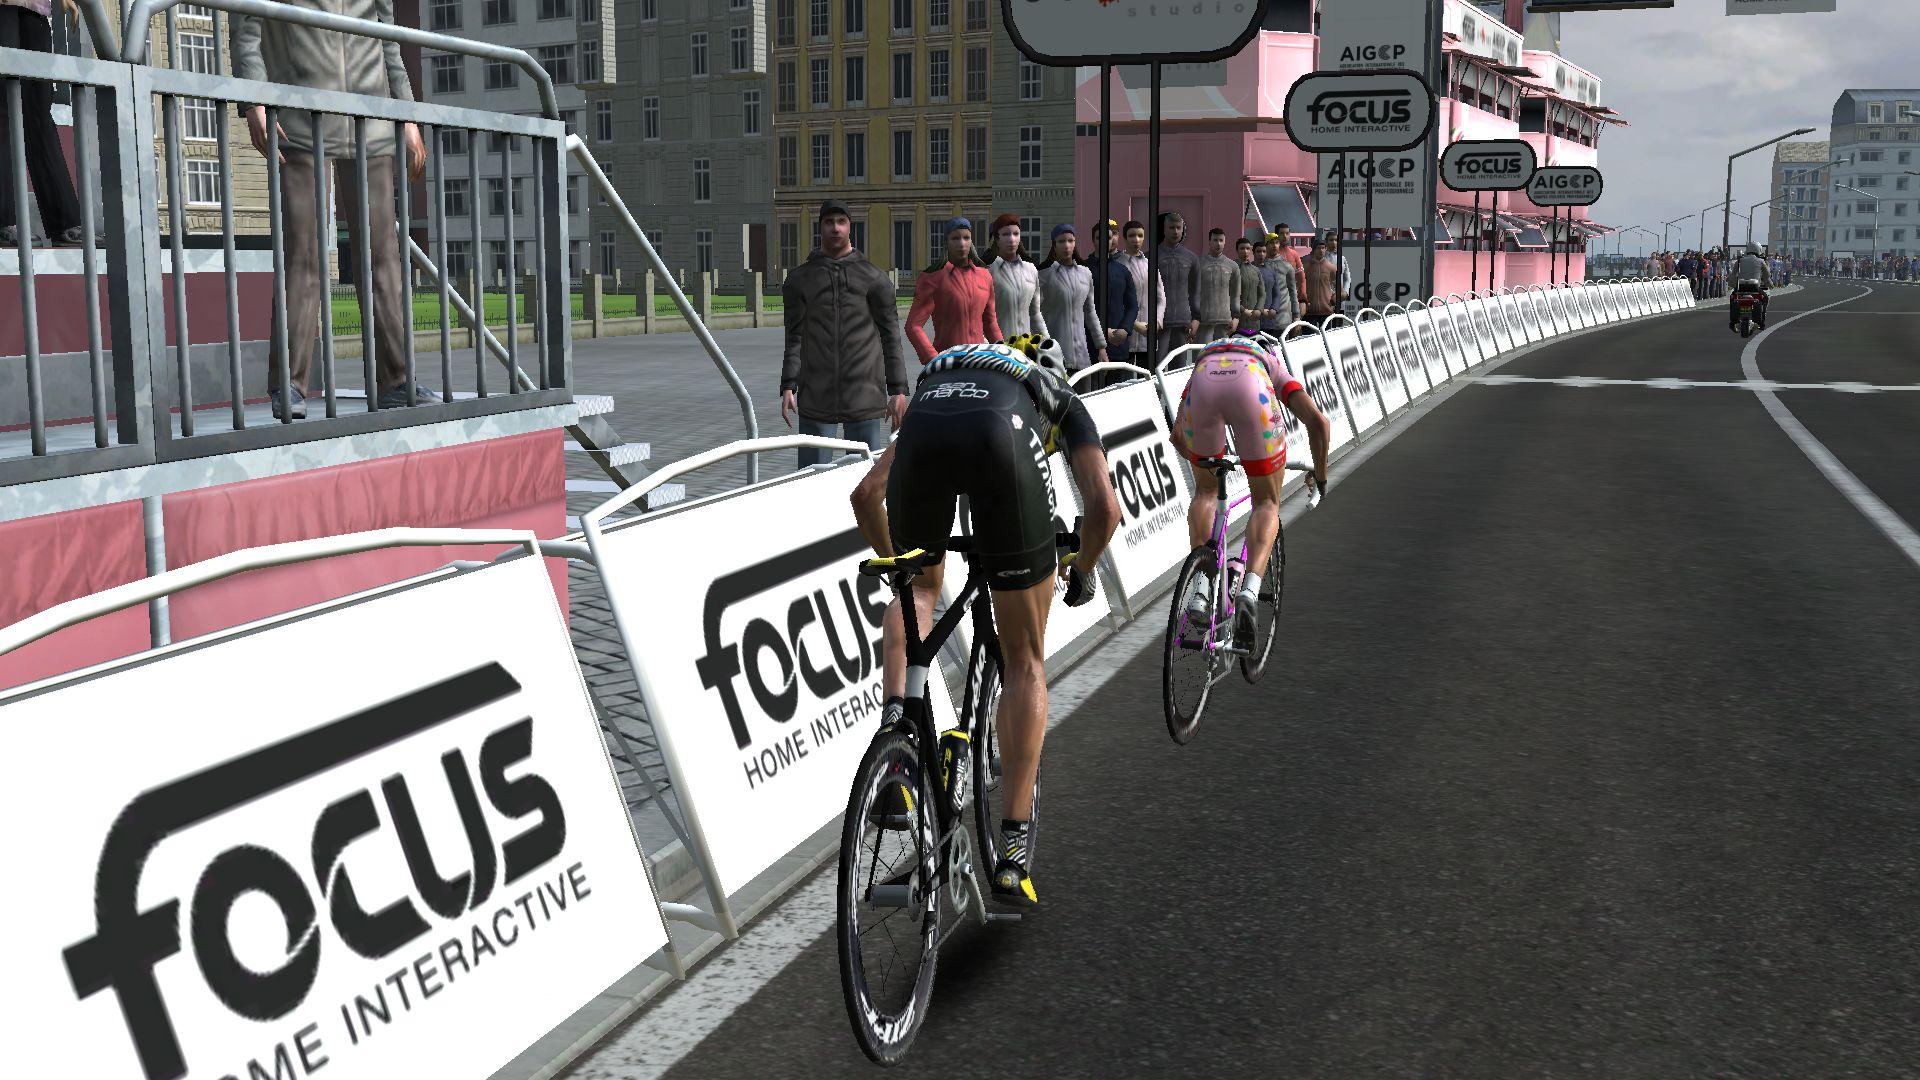 pcmdaily.com/images/mg/2019/Races/GTM/Giro/mg19_giro_18_PCM0260.jpg